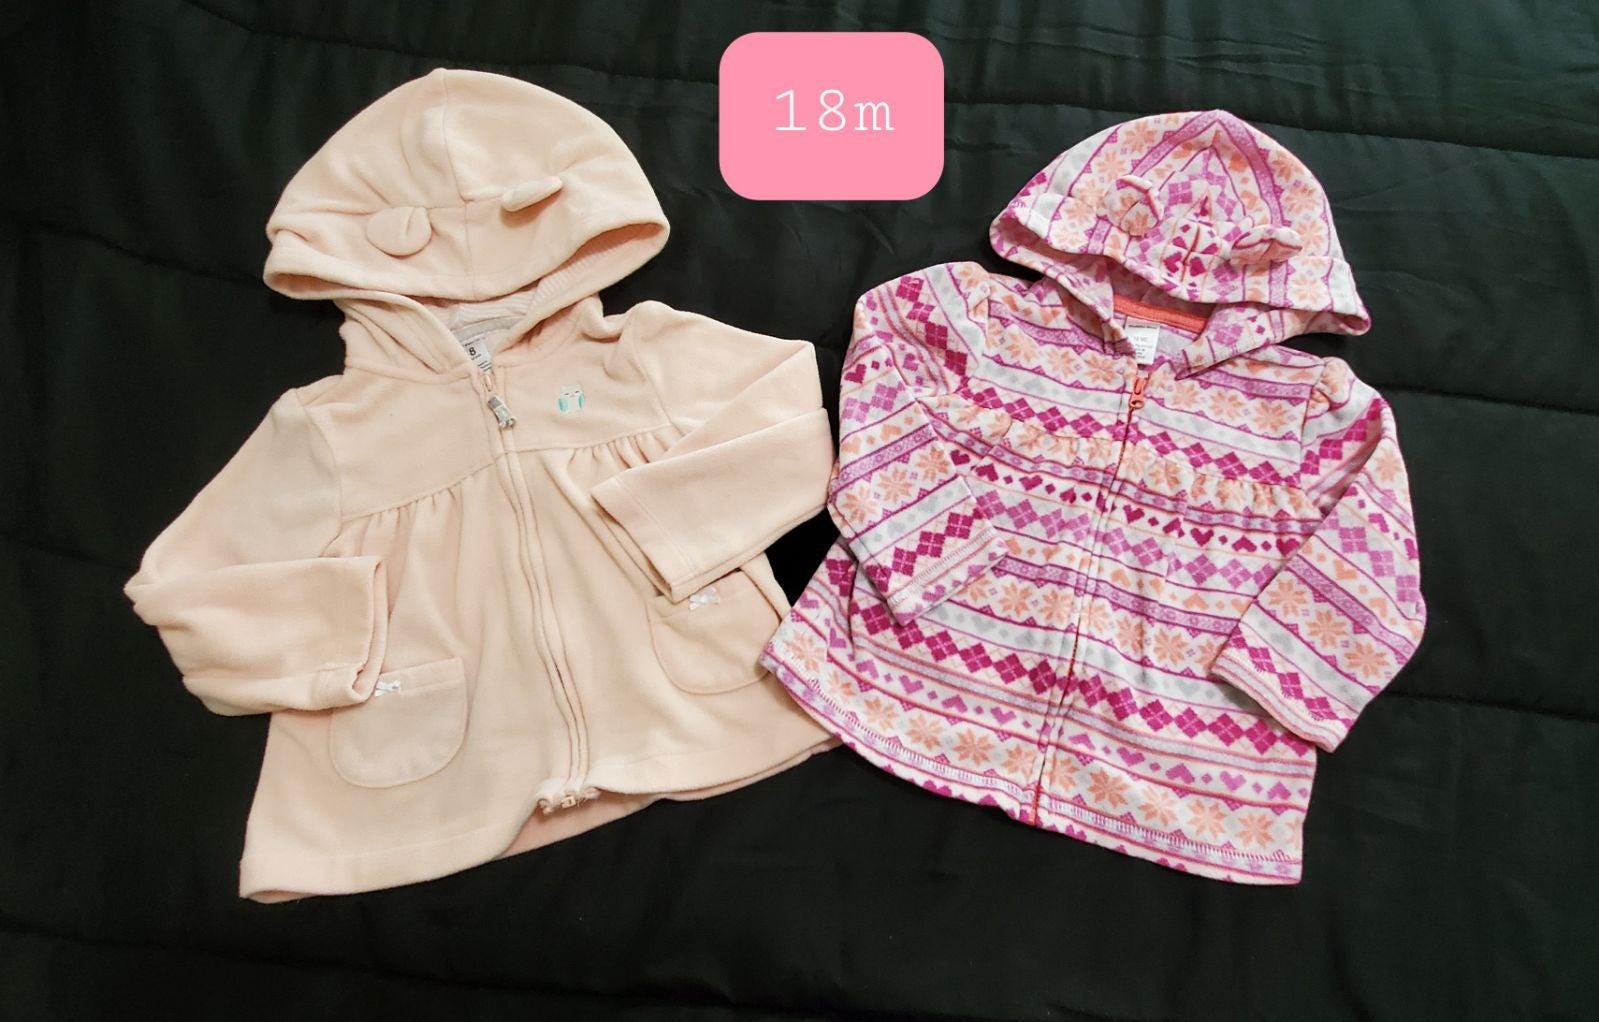 18m Fleece Jackets